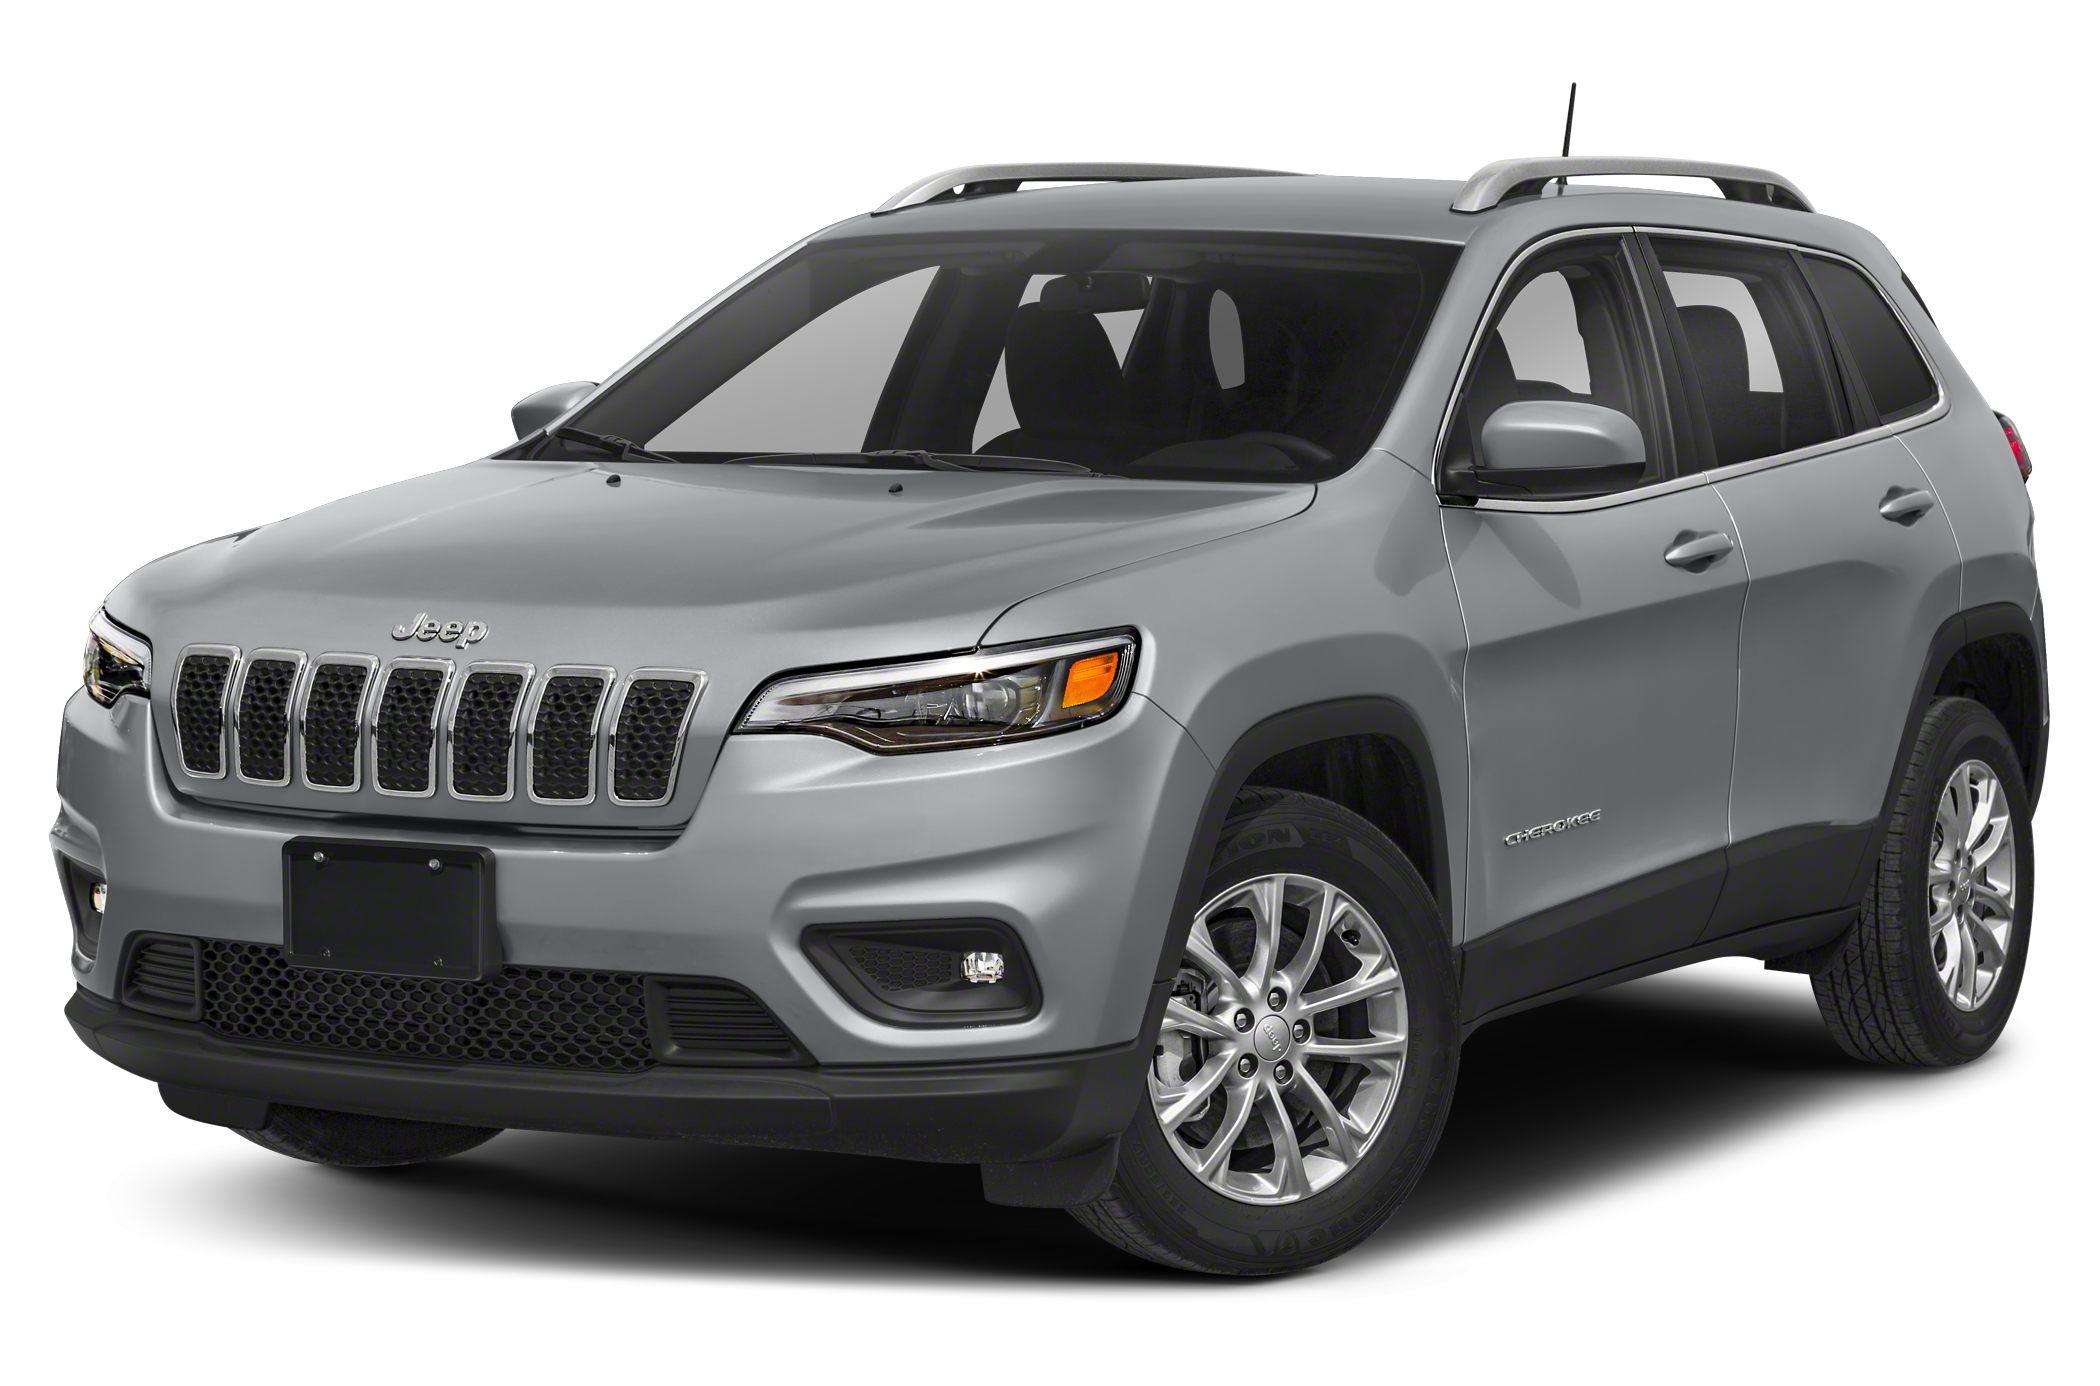 2016 Jeep Grand Cherokee Oil Change >> The 2019 Jeep Cherokee looks like the Jeep Compass. - Autoblog